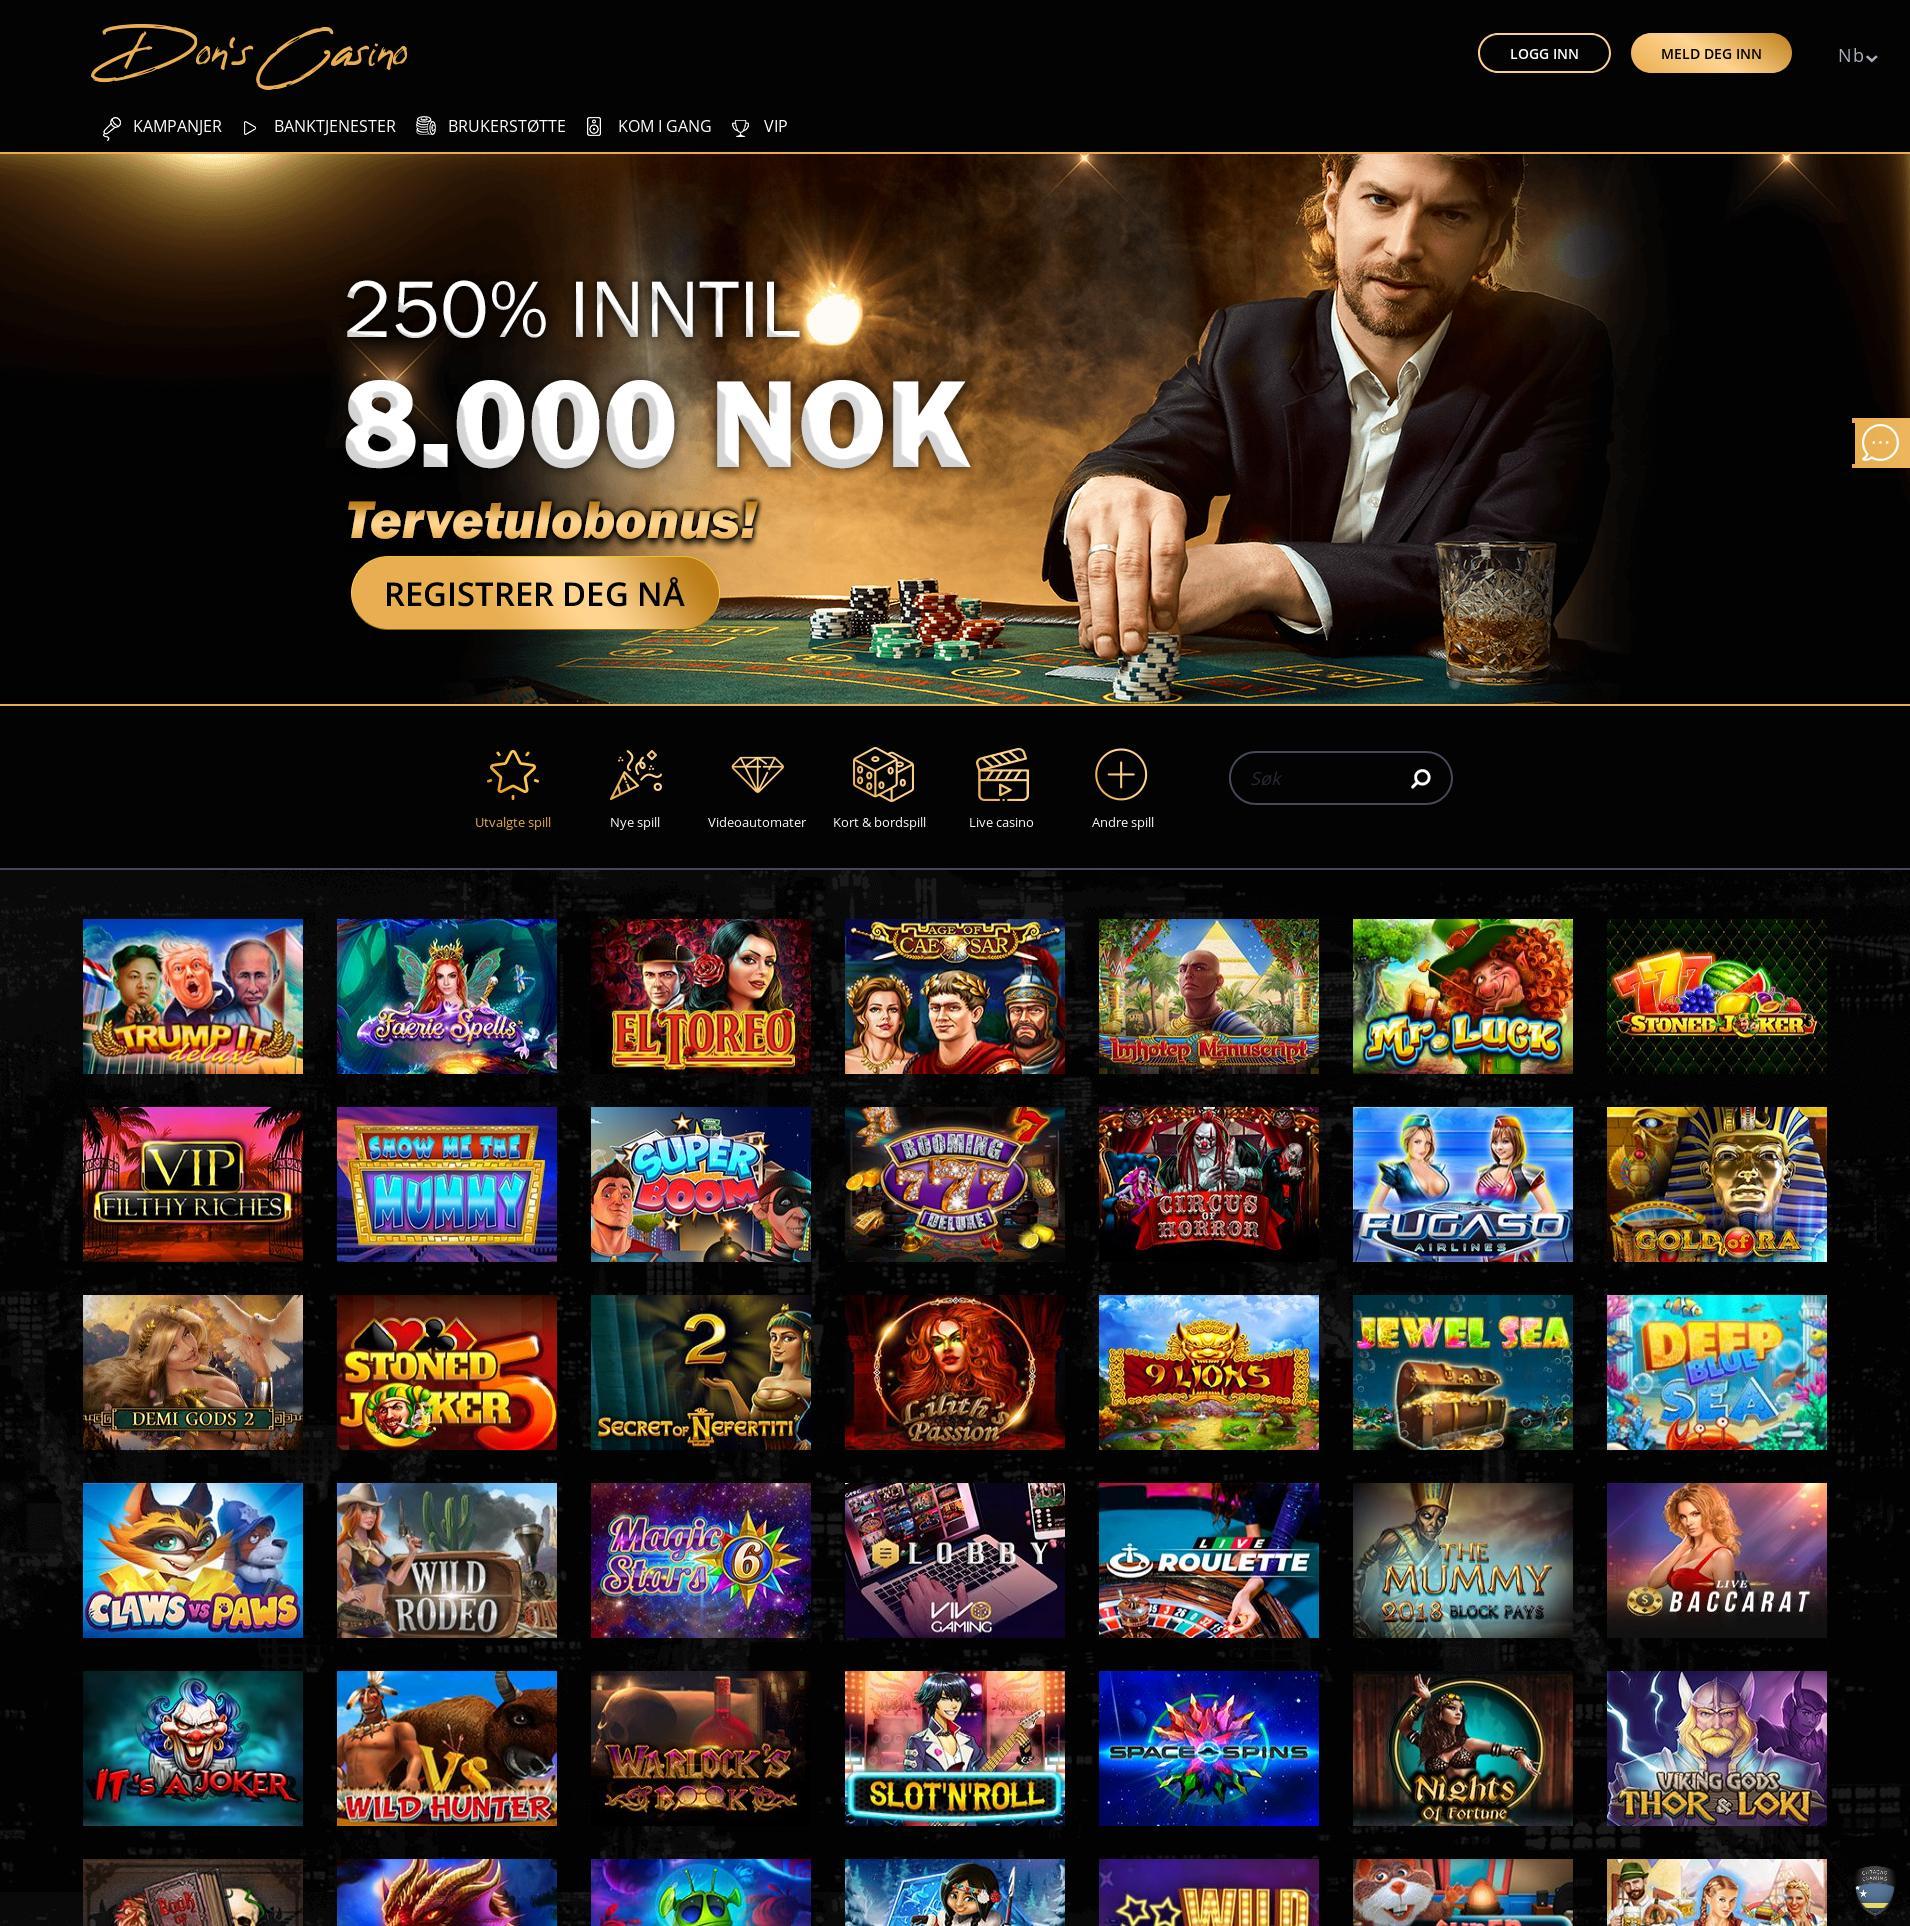 Casino screen Lobby 2019-07-17 for Norway